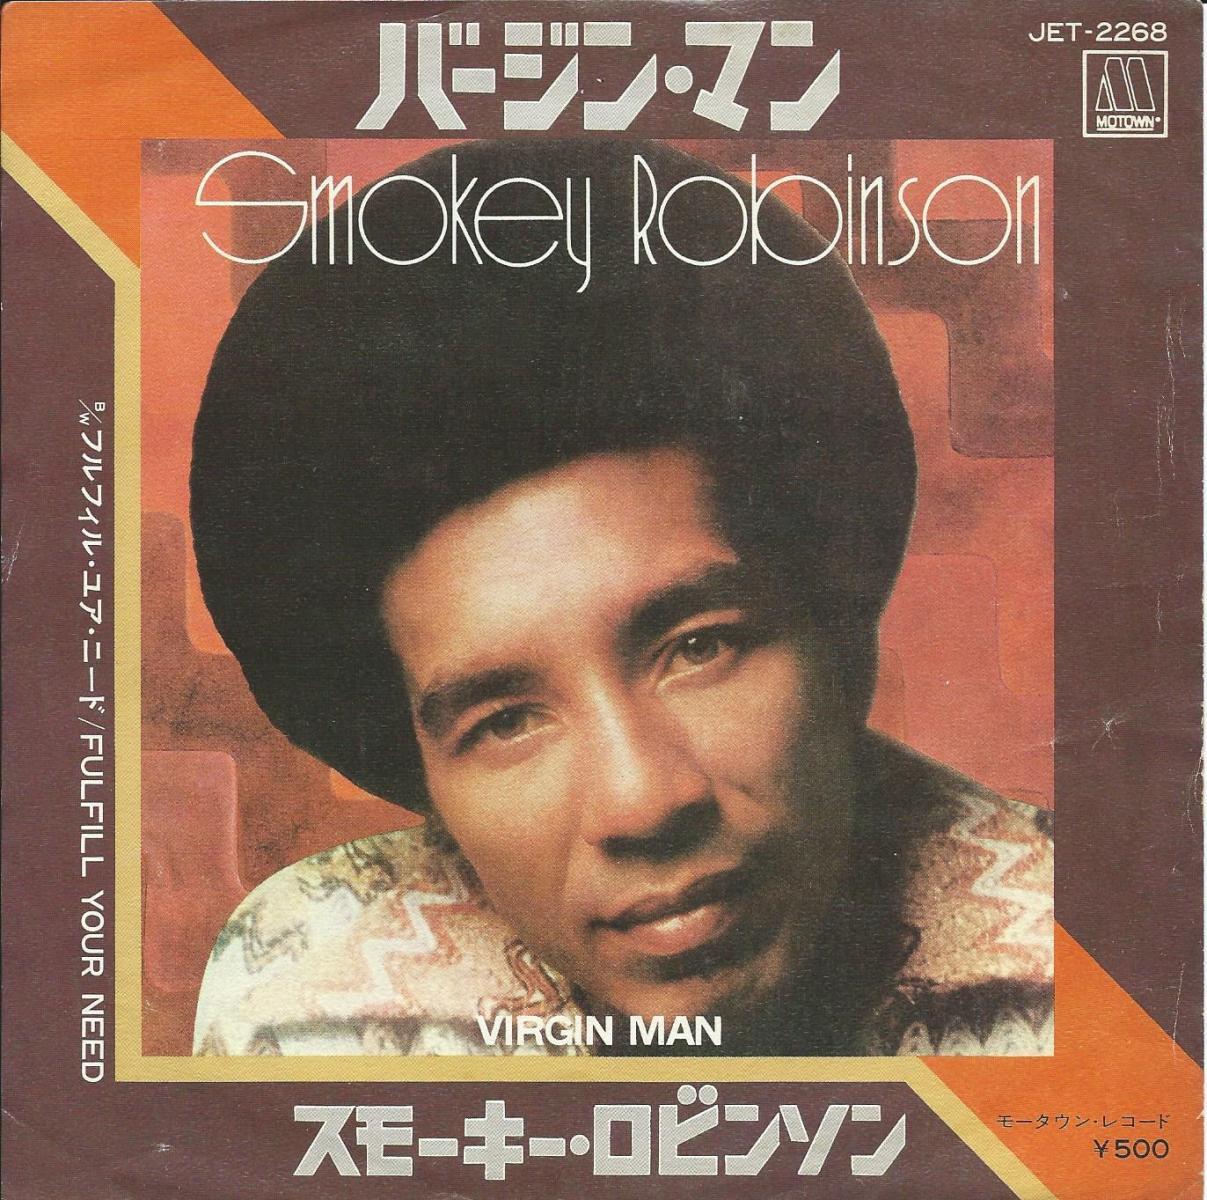 SMOKEY ROBINSON スモーキー・ロビンソン / VIRGIN MAN バージン・マン (7